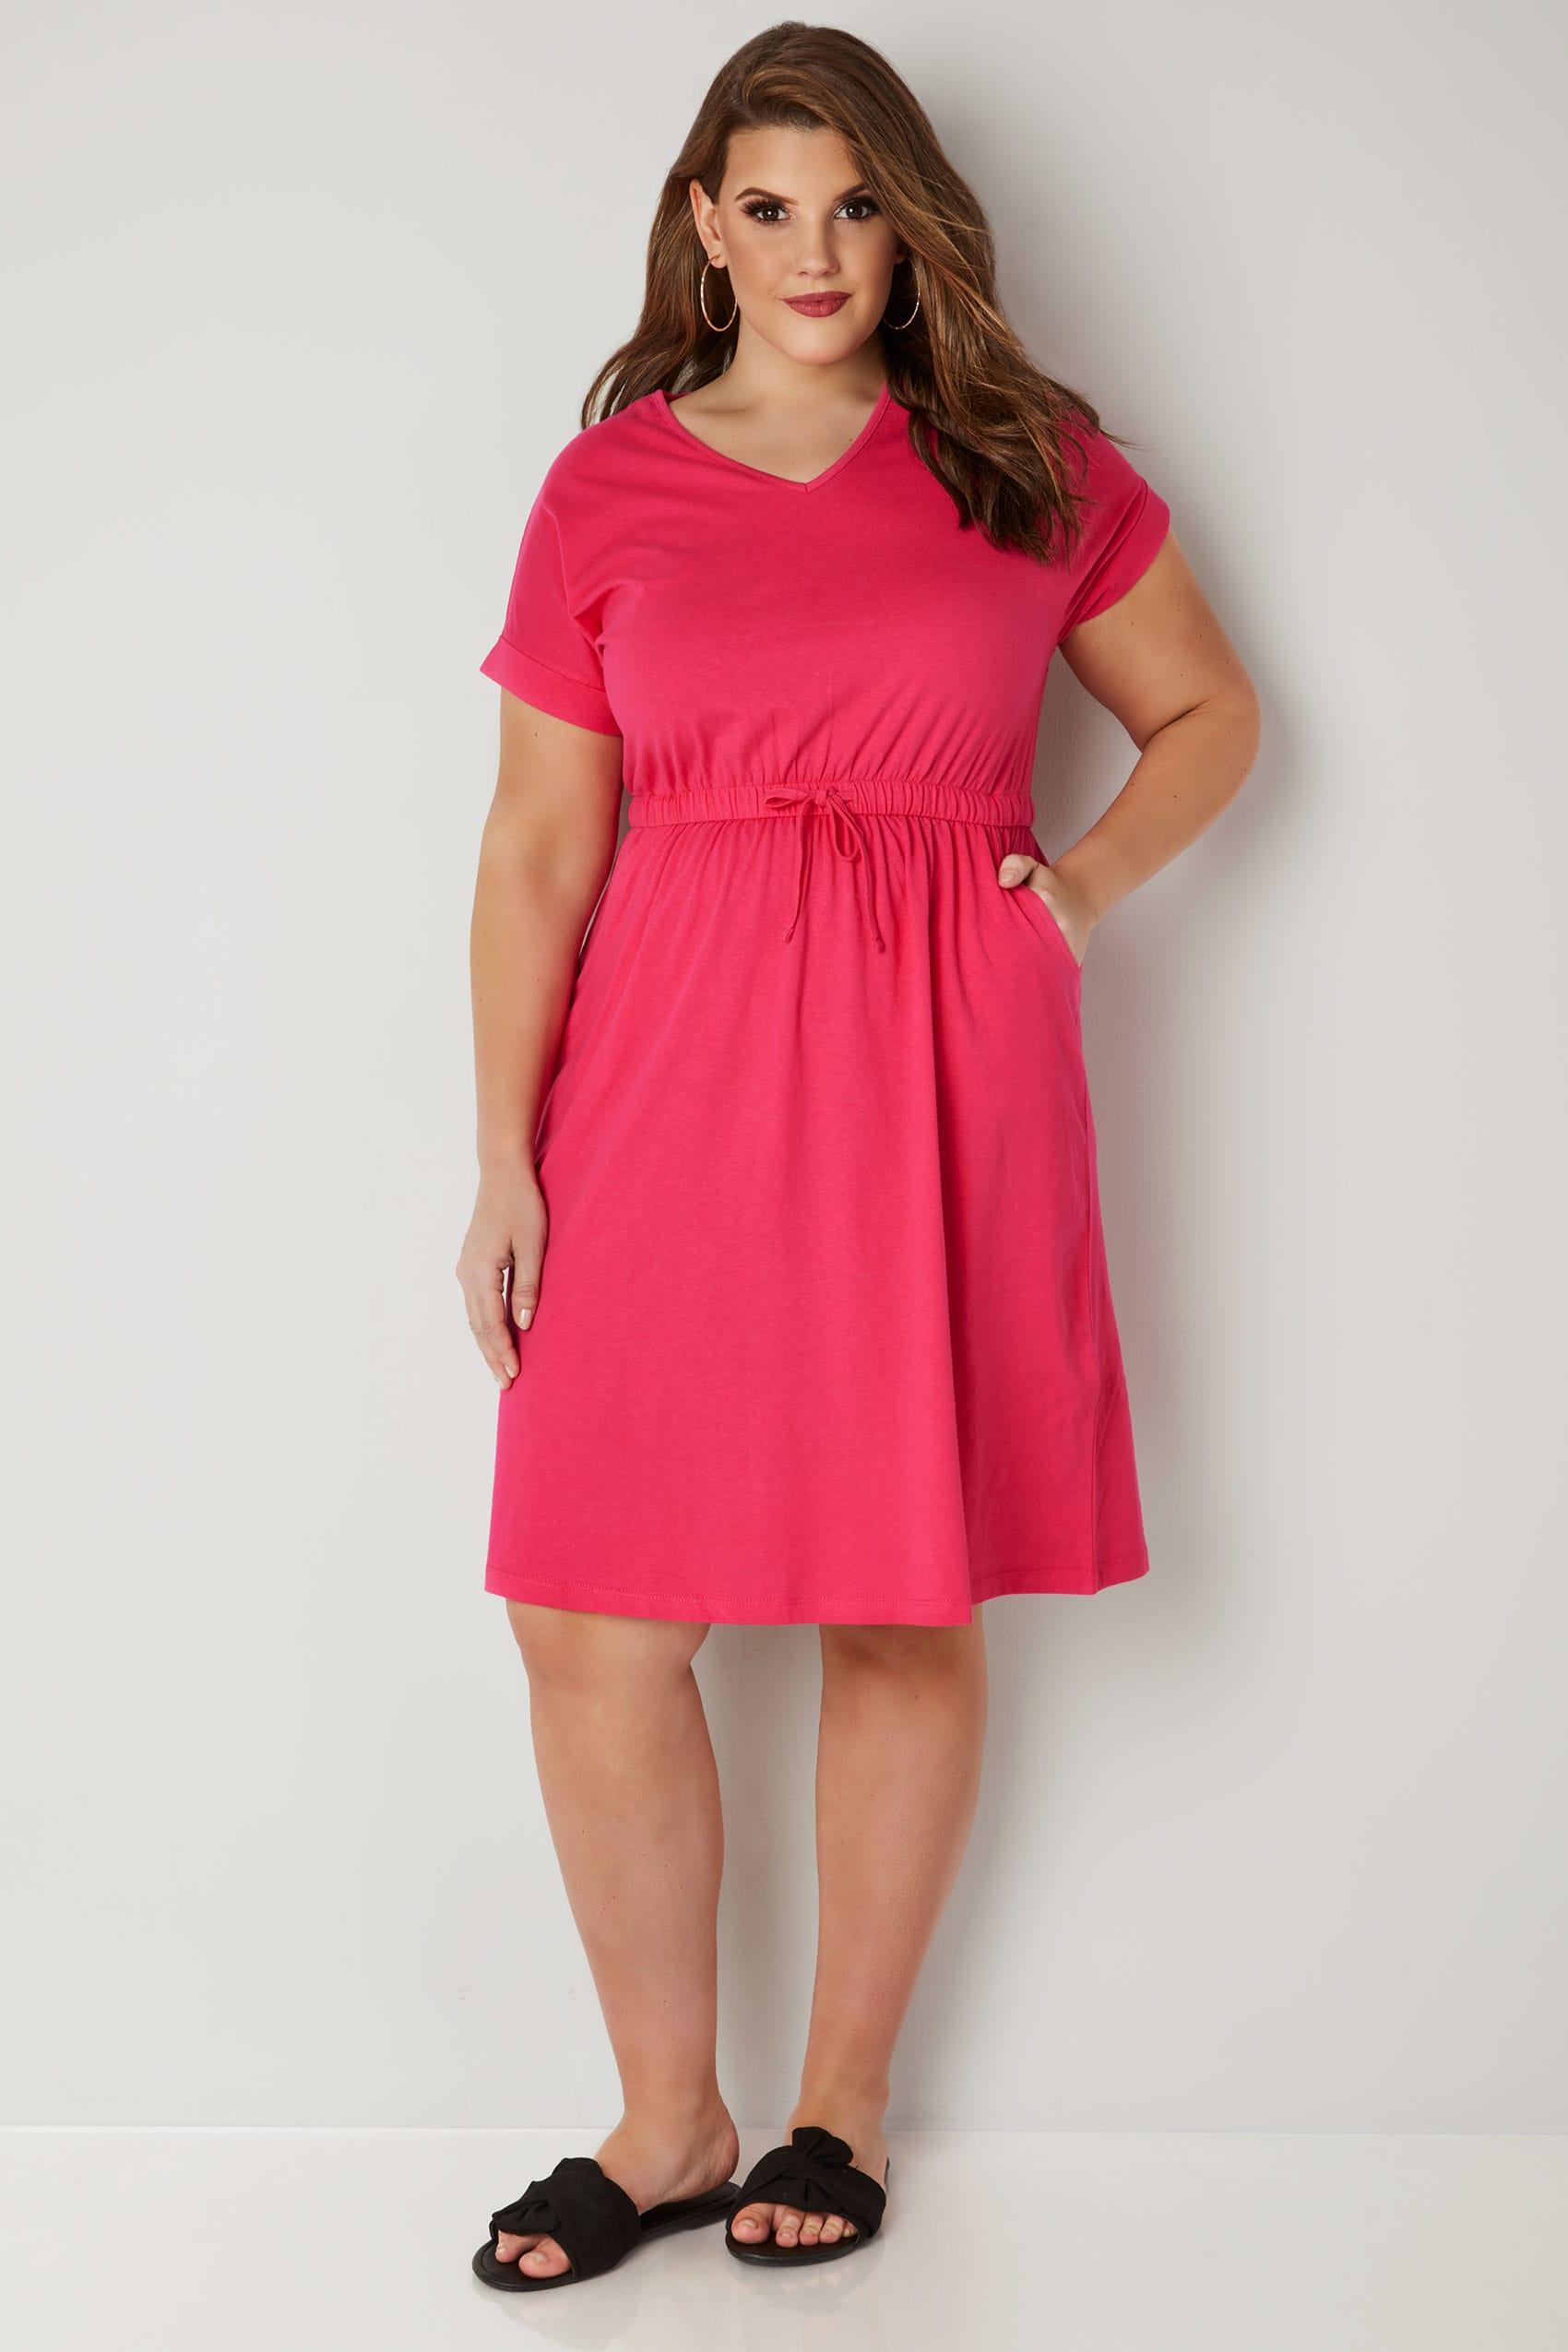 Pinkes T-Shirt Kleid aus Jersey mit Kordelzug, Große ...